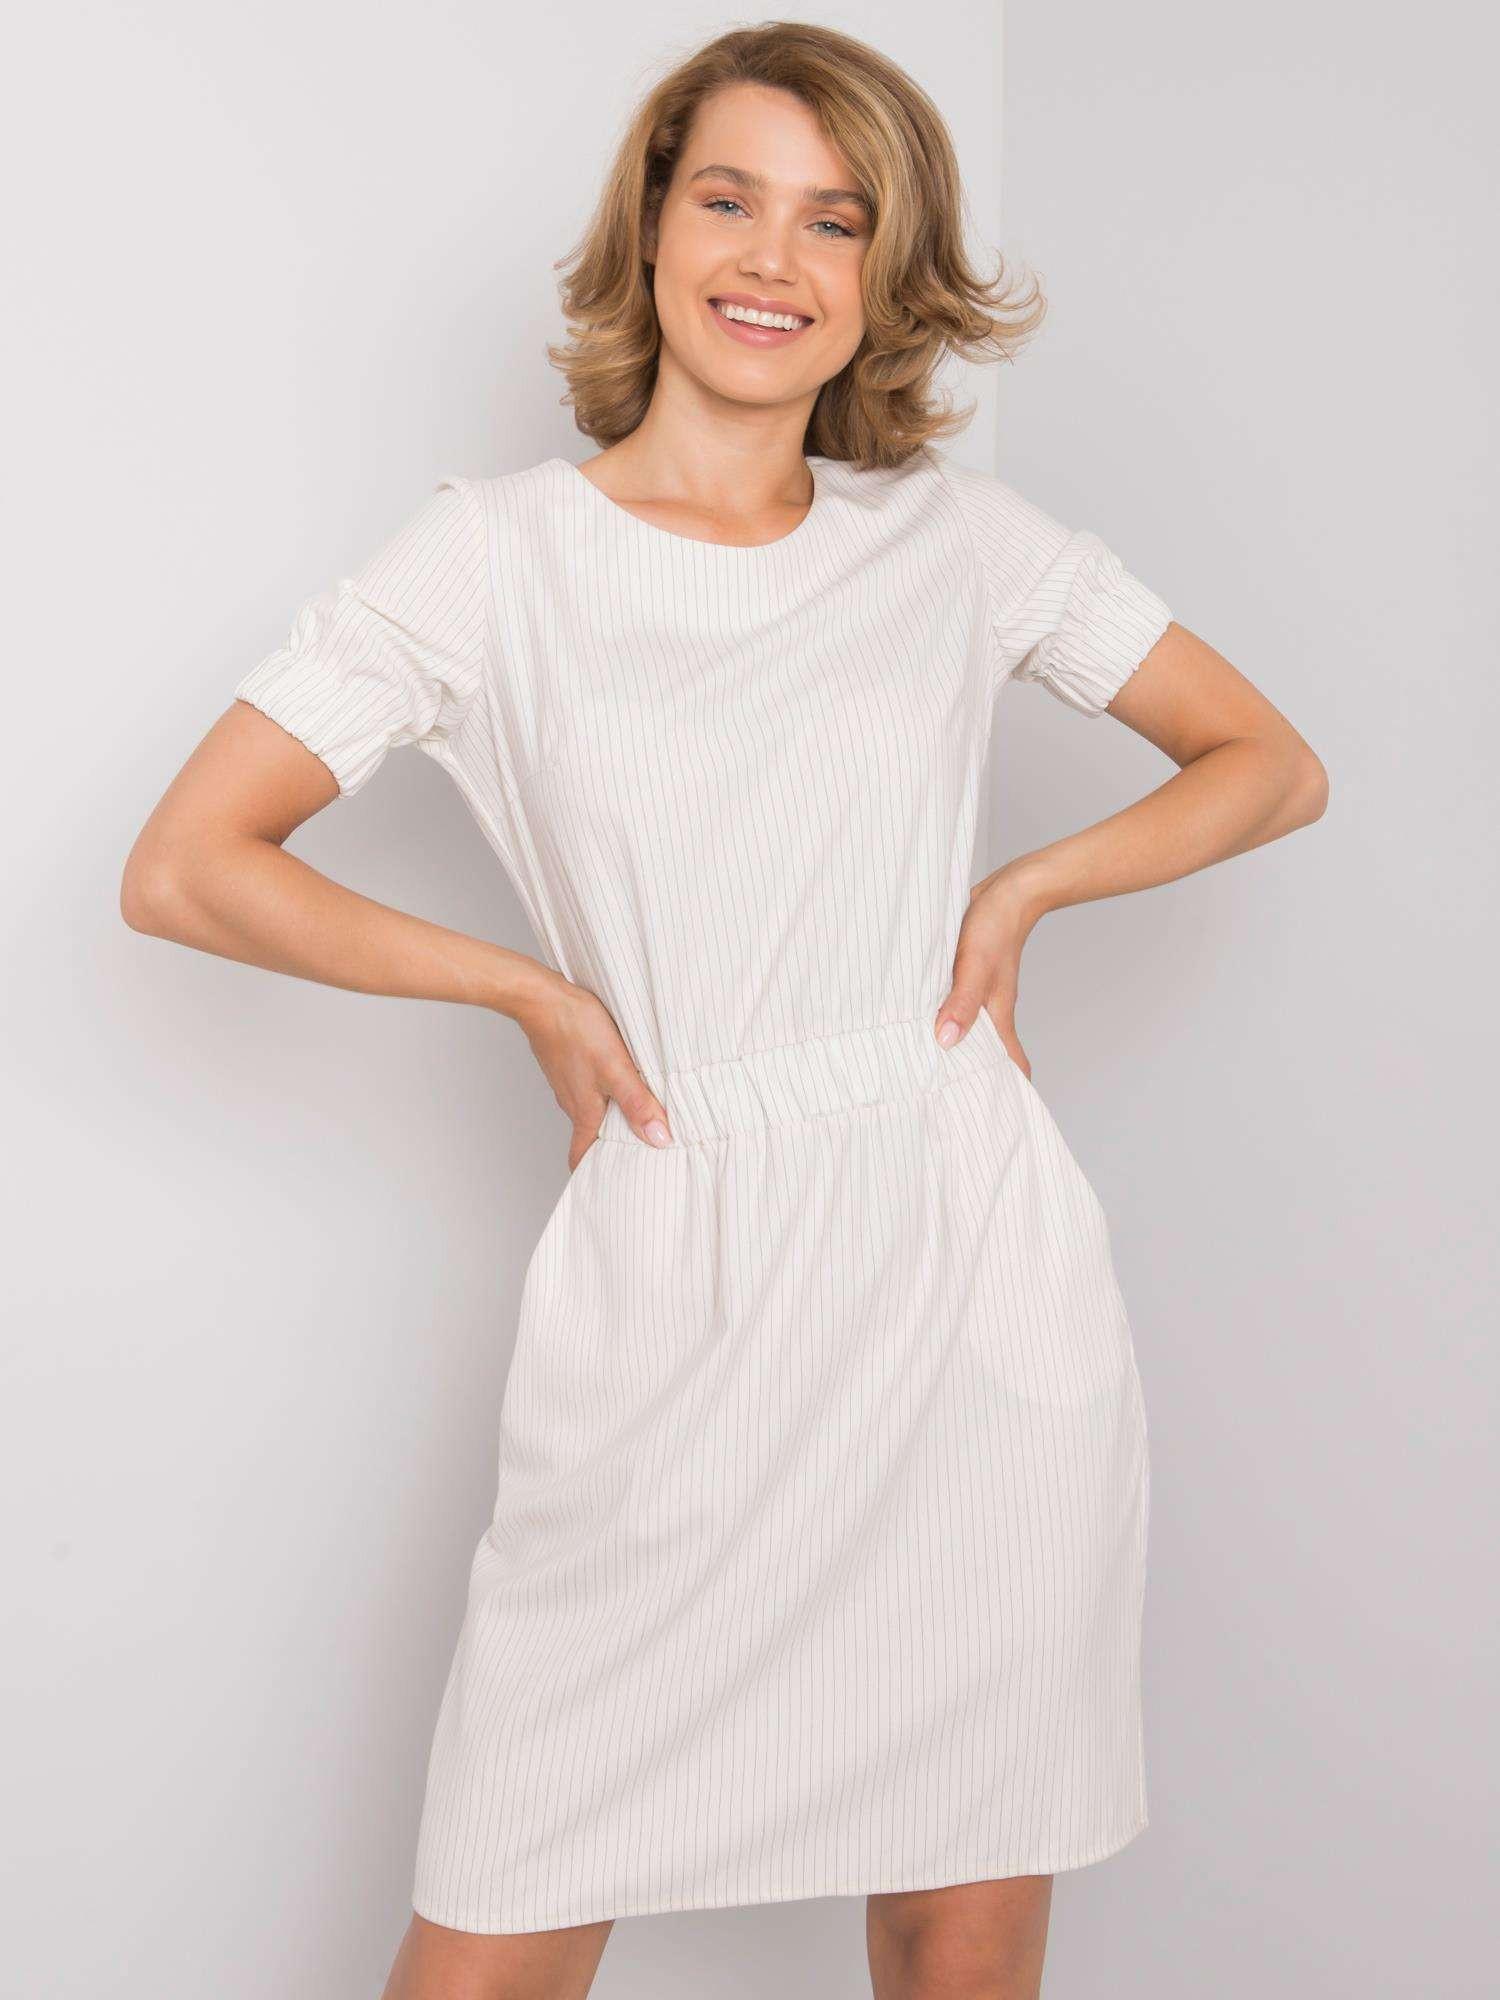 Dámske neformálne šaty Ecru 36